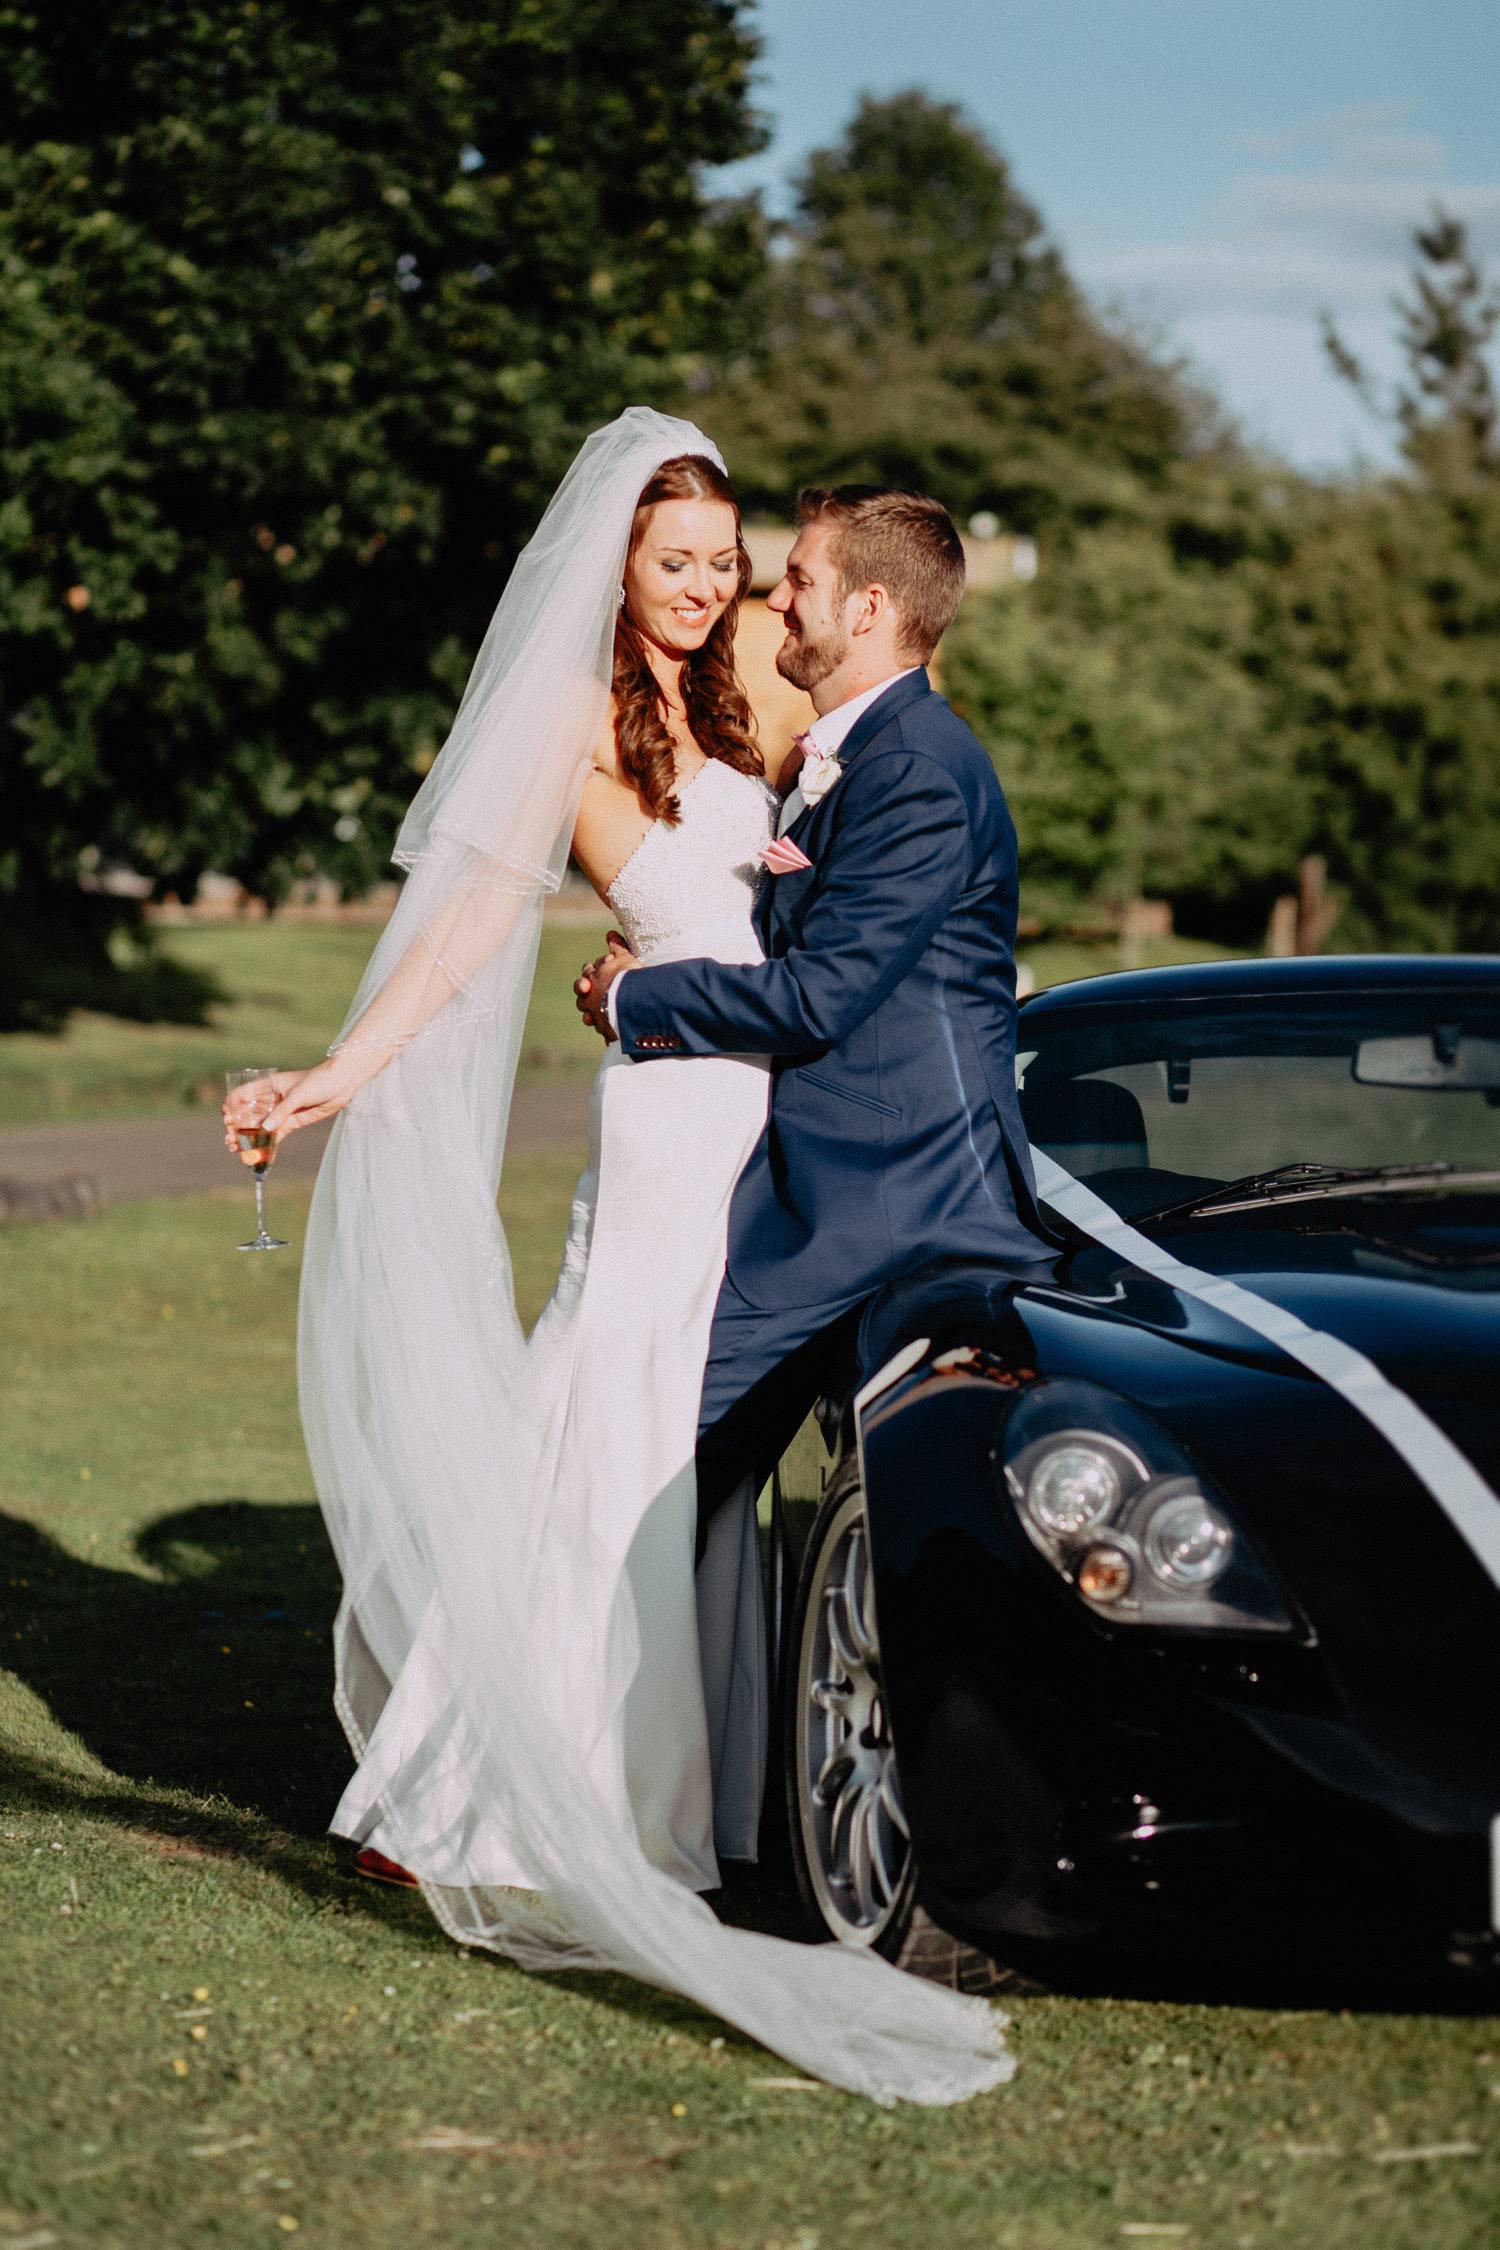 Natural-Retreats-Yorkshire-Wedding-Photographer-105.jpg